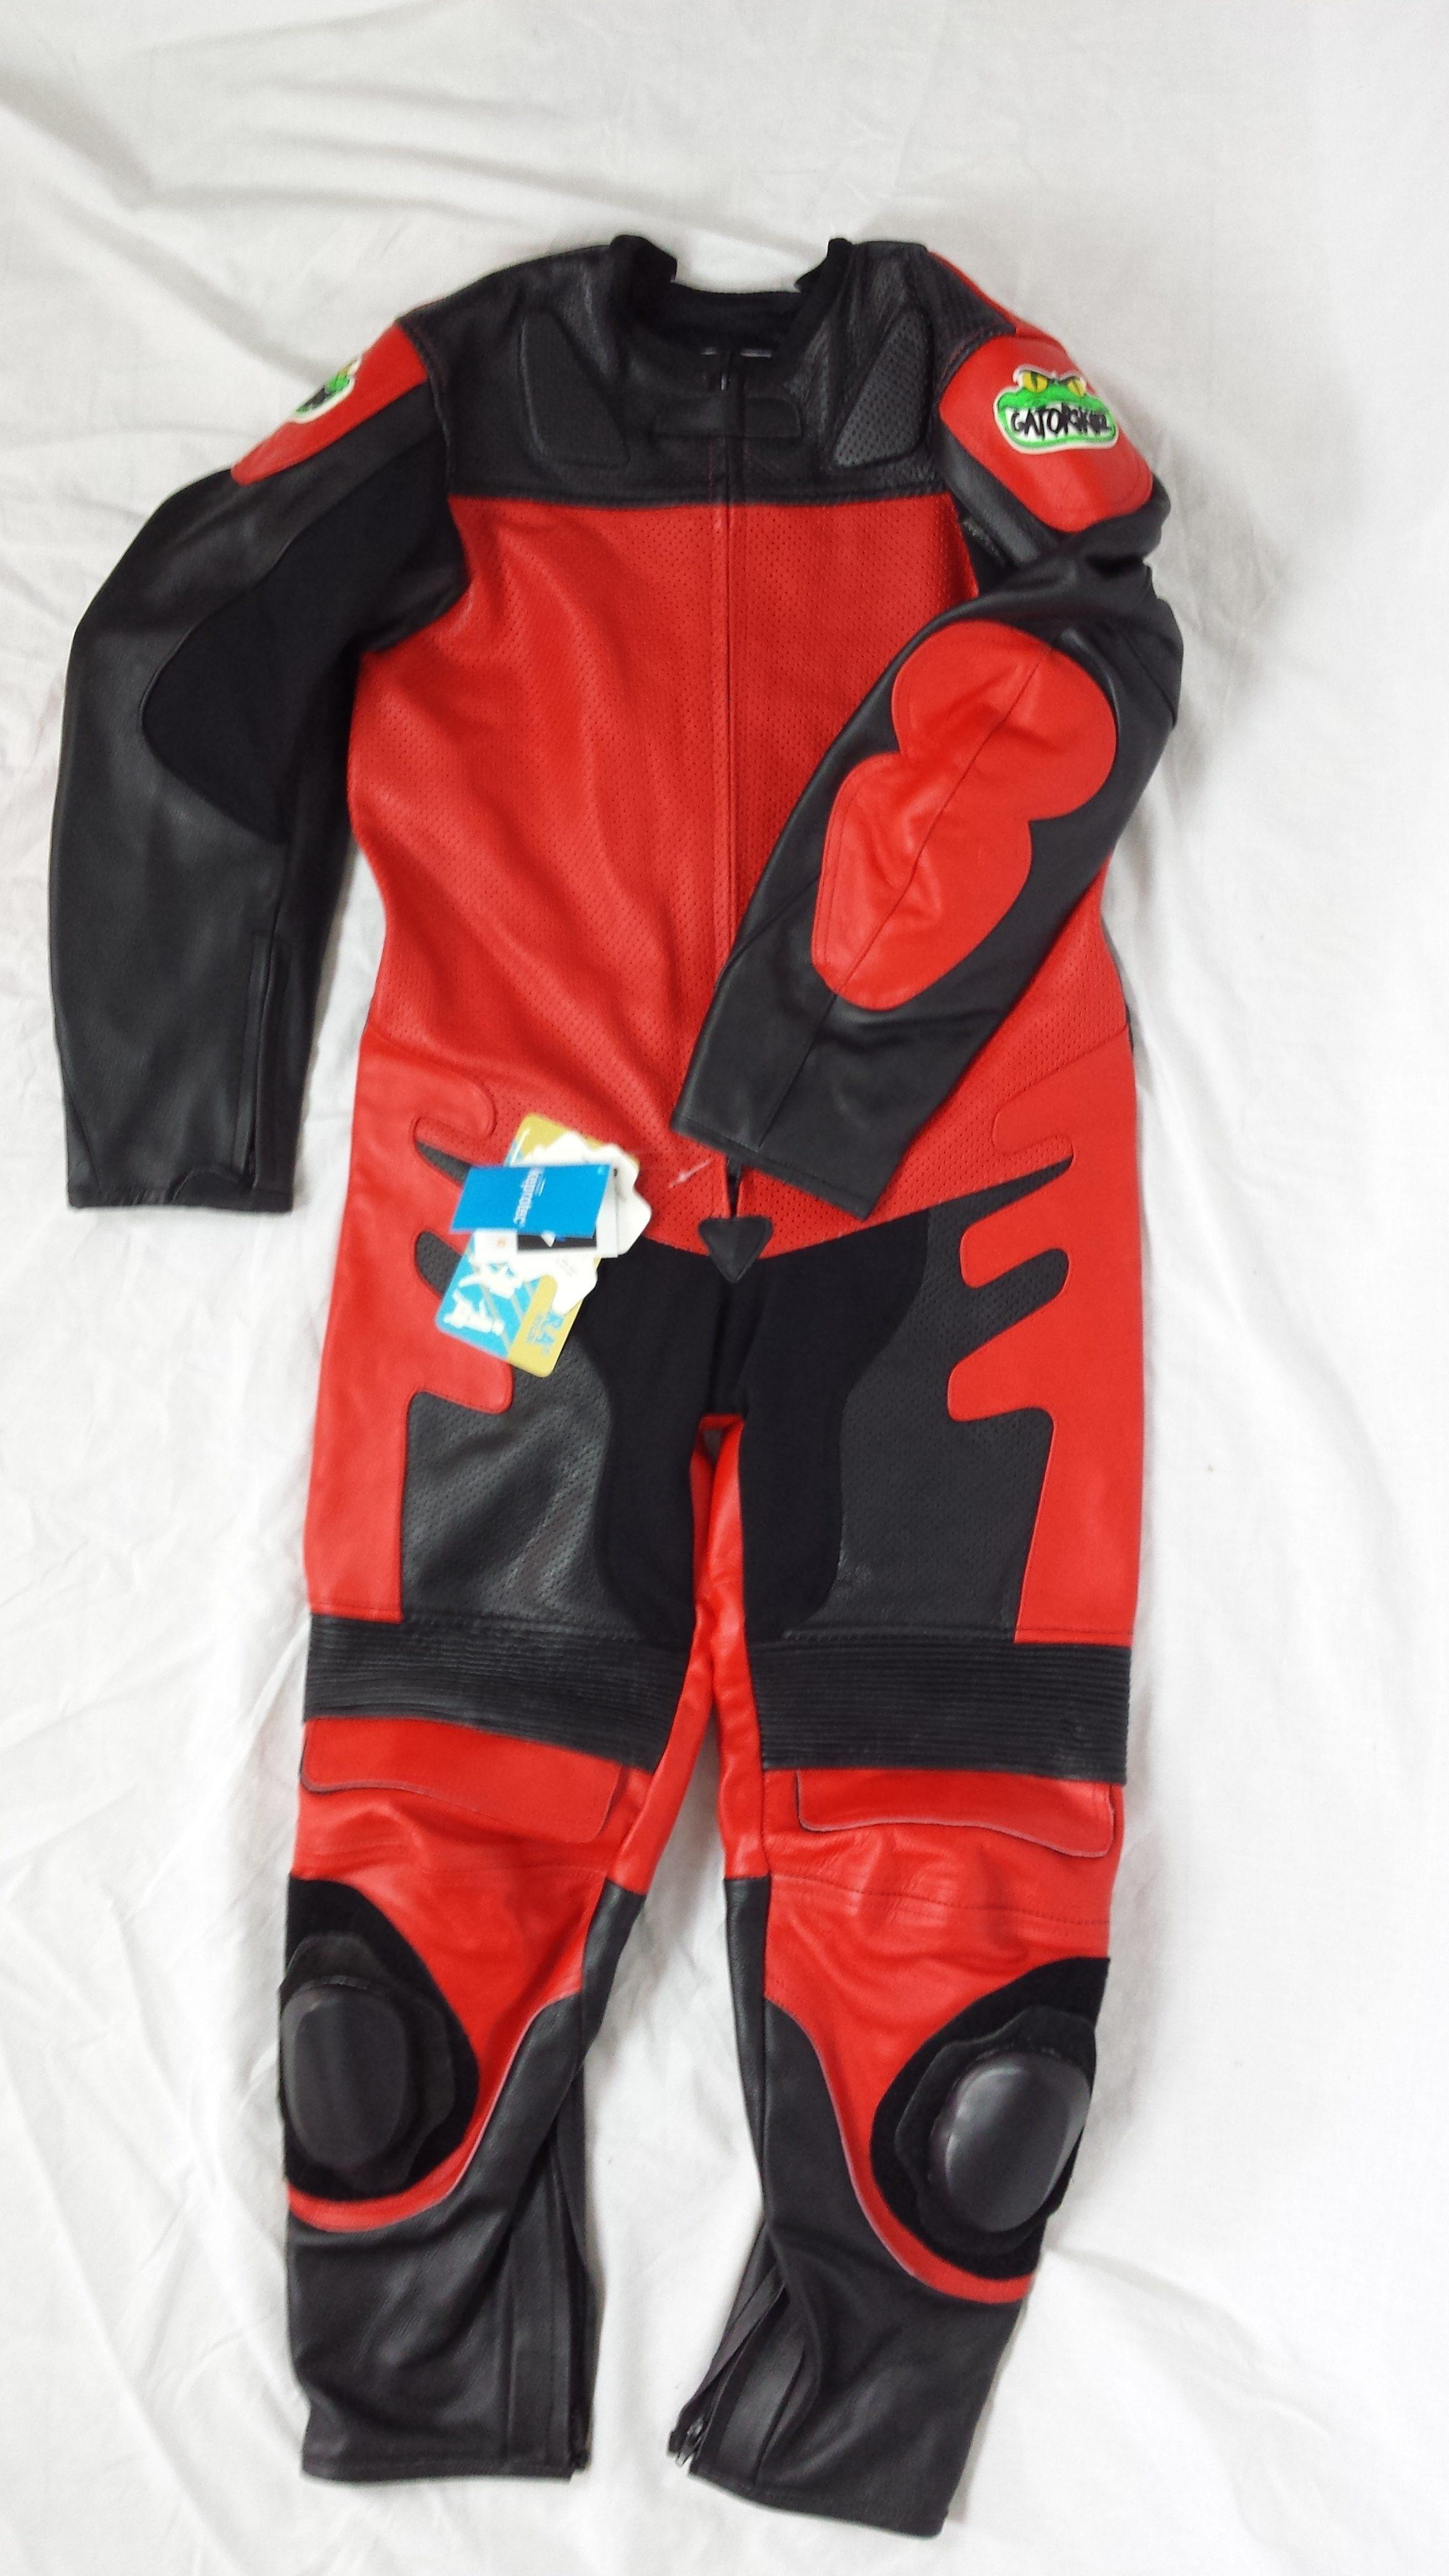 Gatorskinz Juniors Full Leather Motorcycle Racing Suit